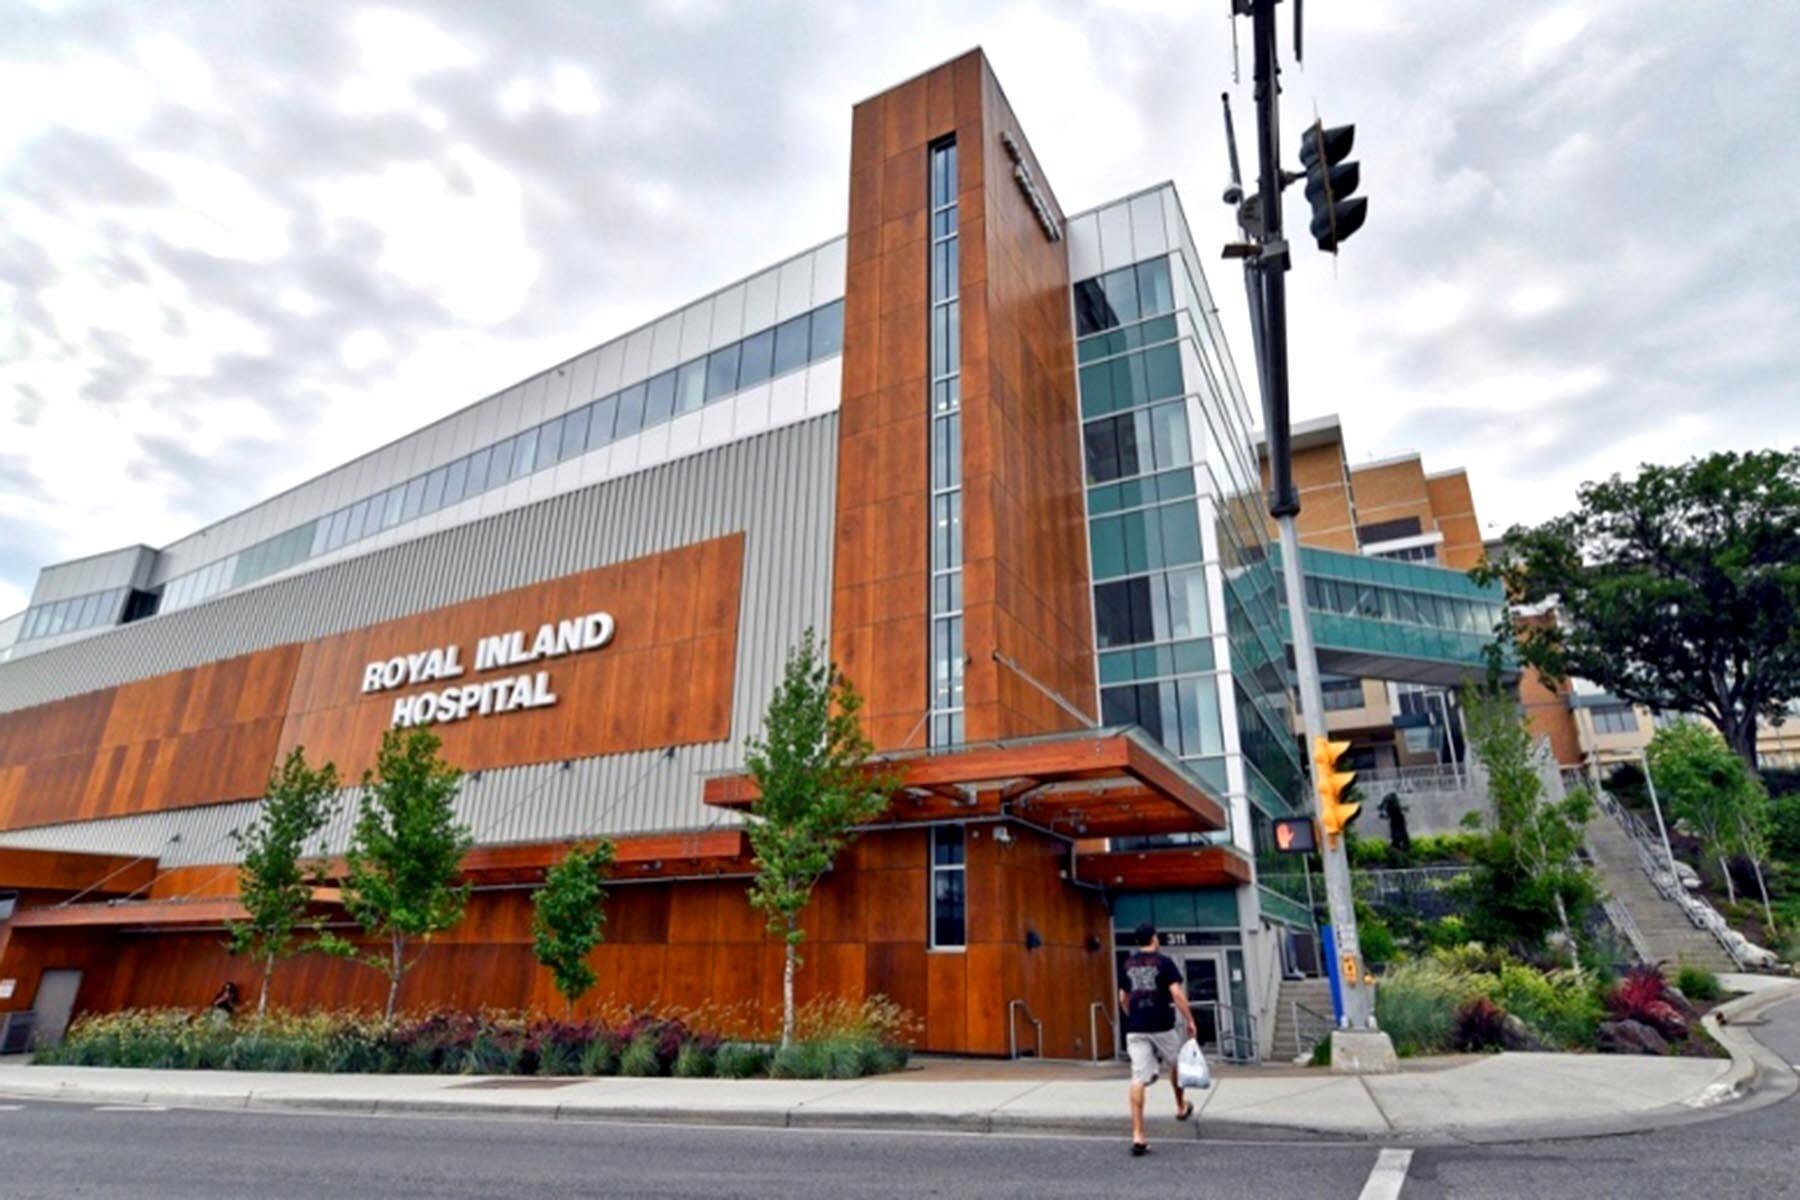 Royal Inland Hospital is in downtown Kamloops at Columbia Street and Third Avenue. (Dave Eagles/Kamloops This Week)